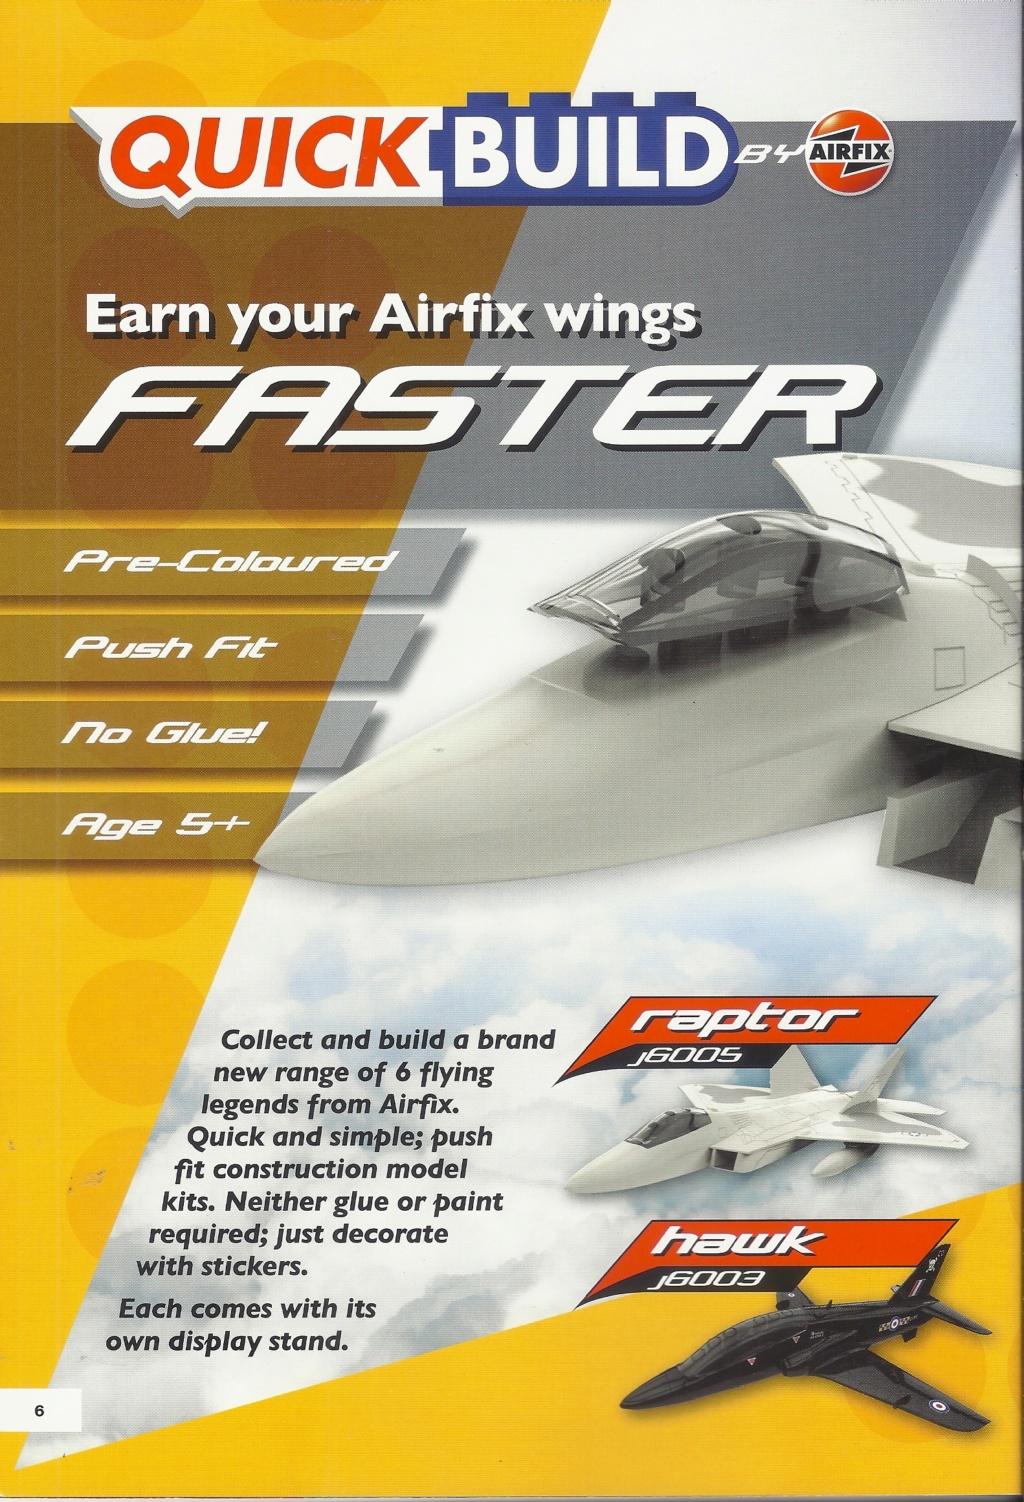 [AIRFIX 2013] Catalogue 2013 Airf1406